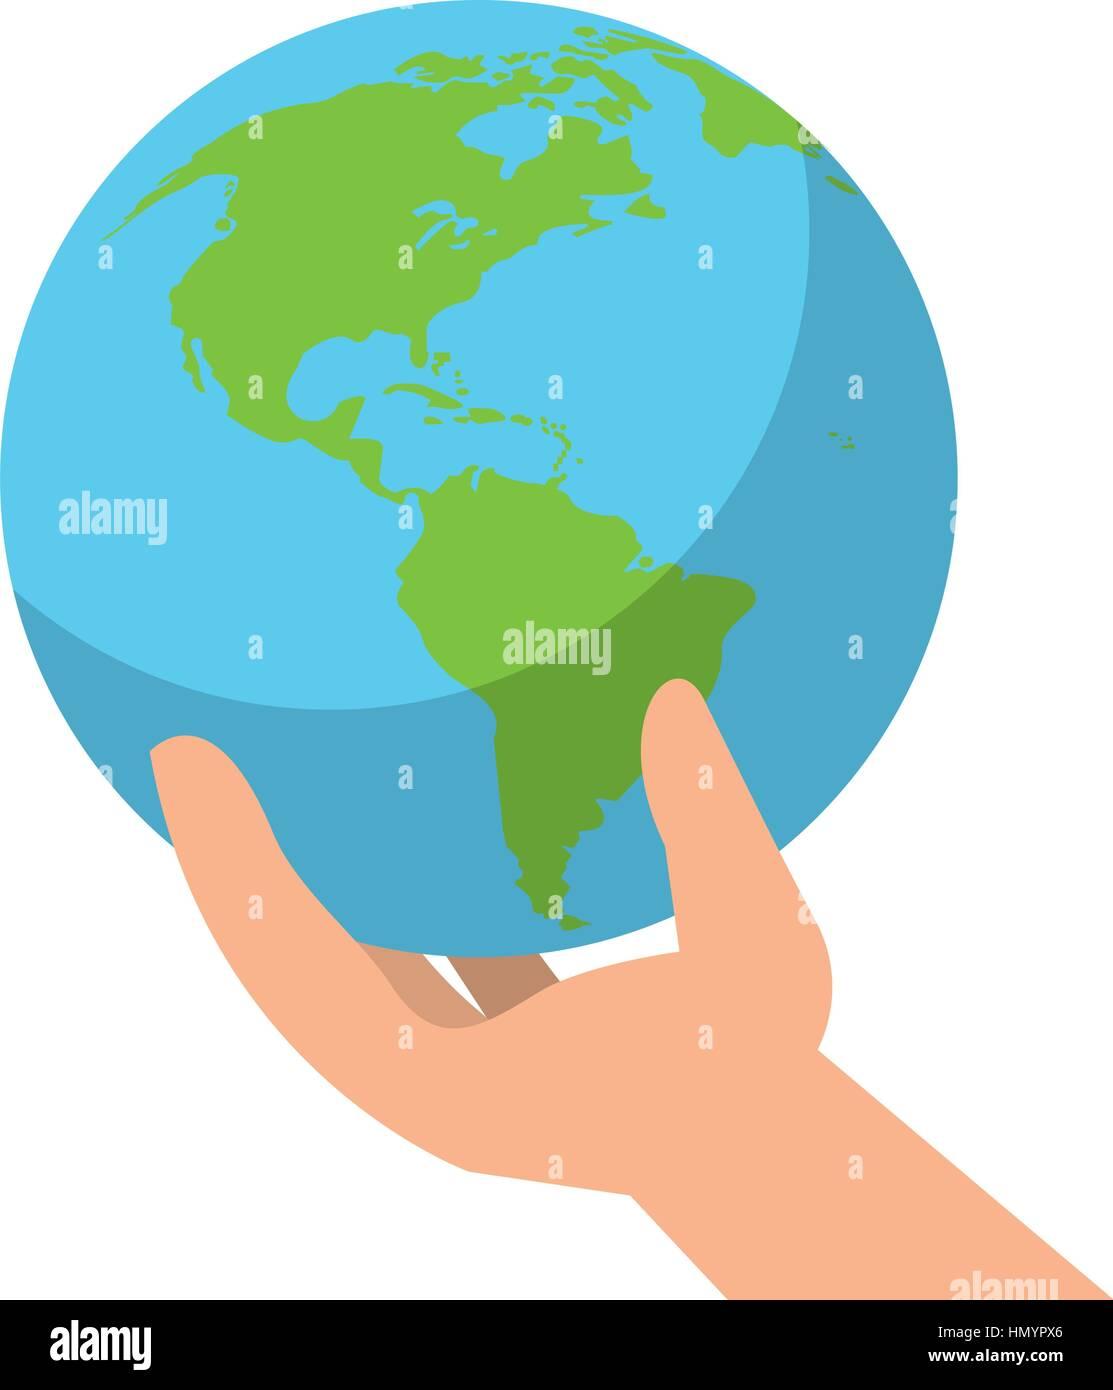 environmental hand holding world care - Stock Image